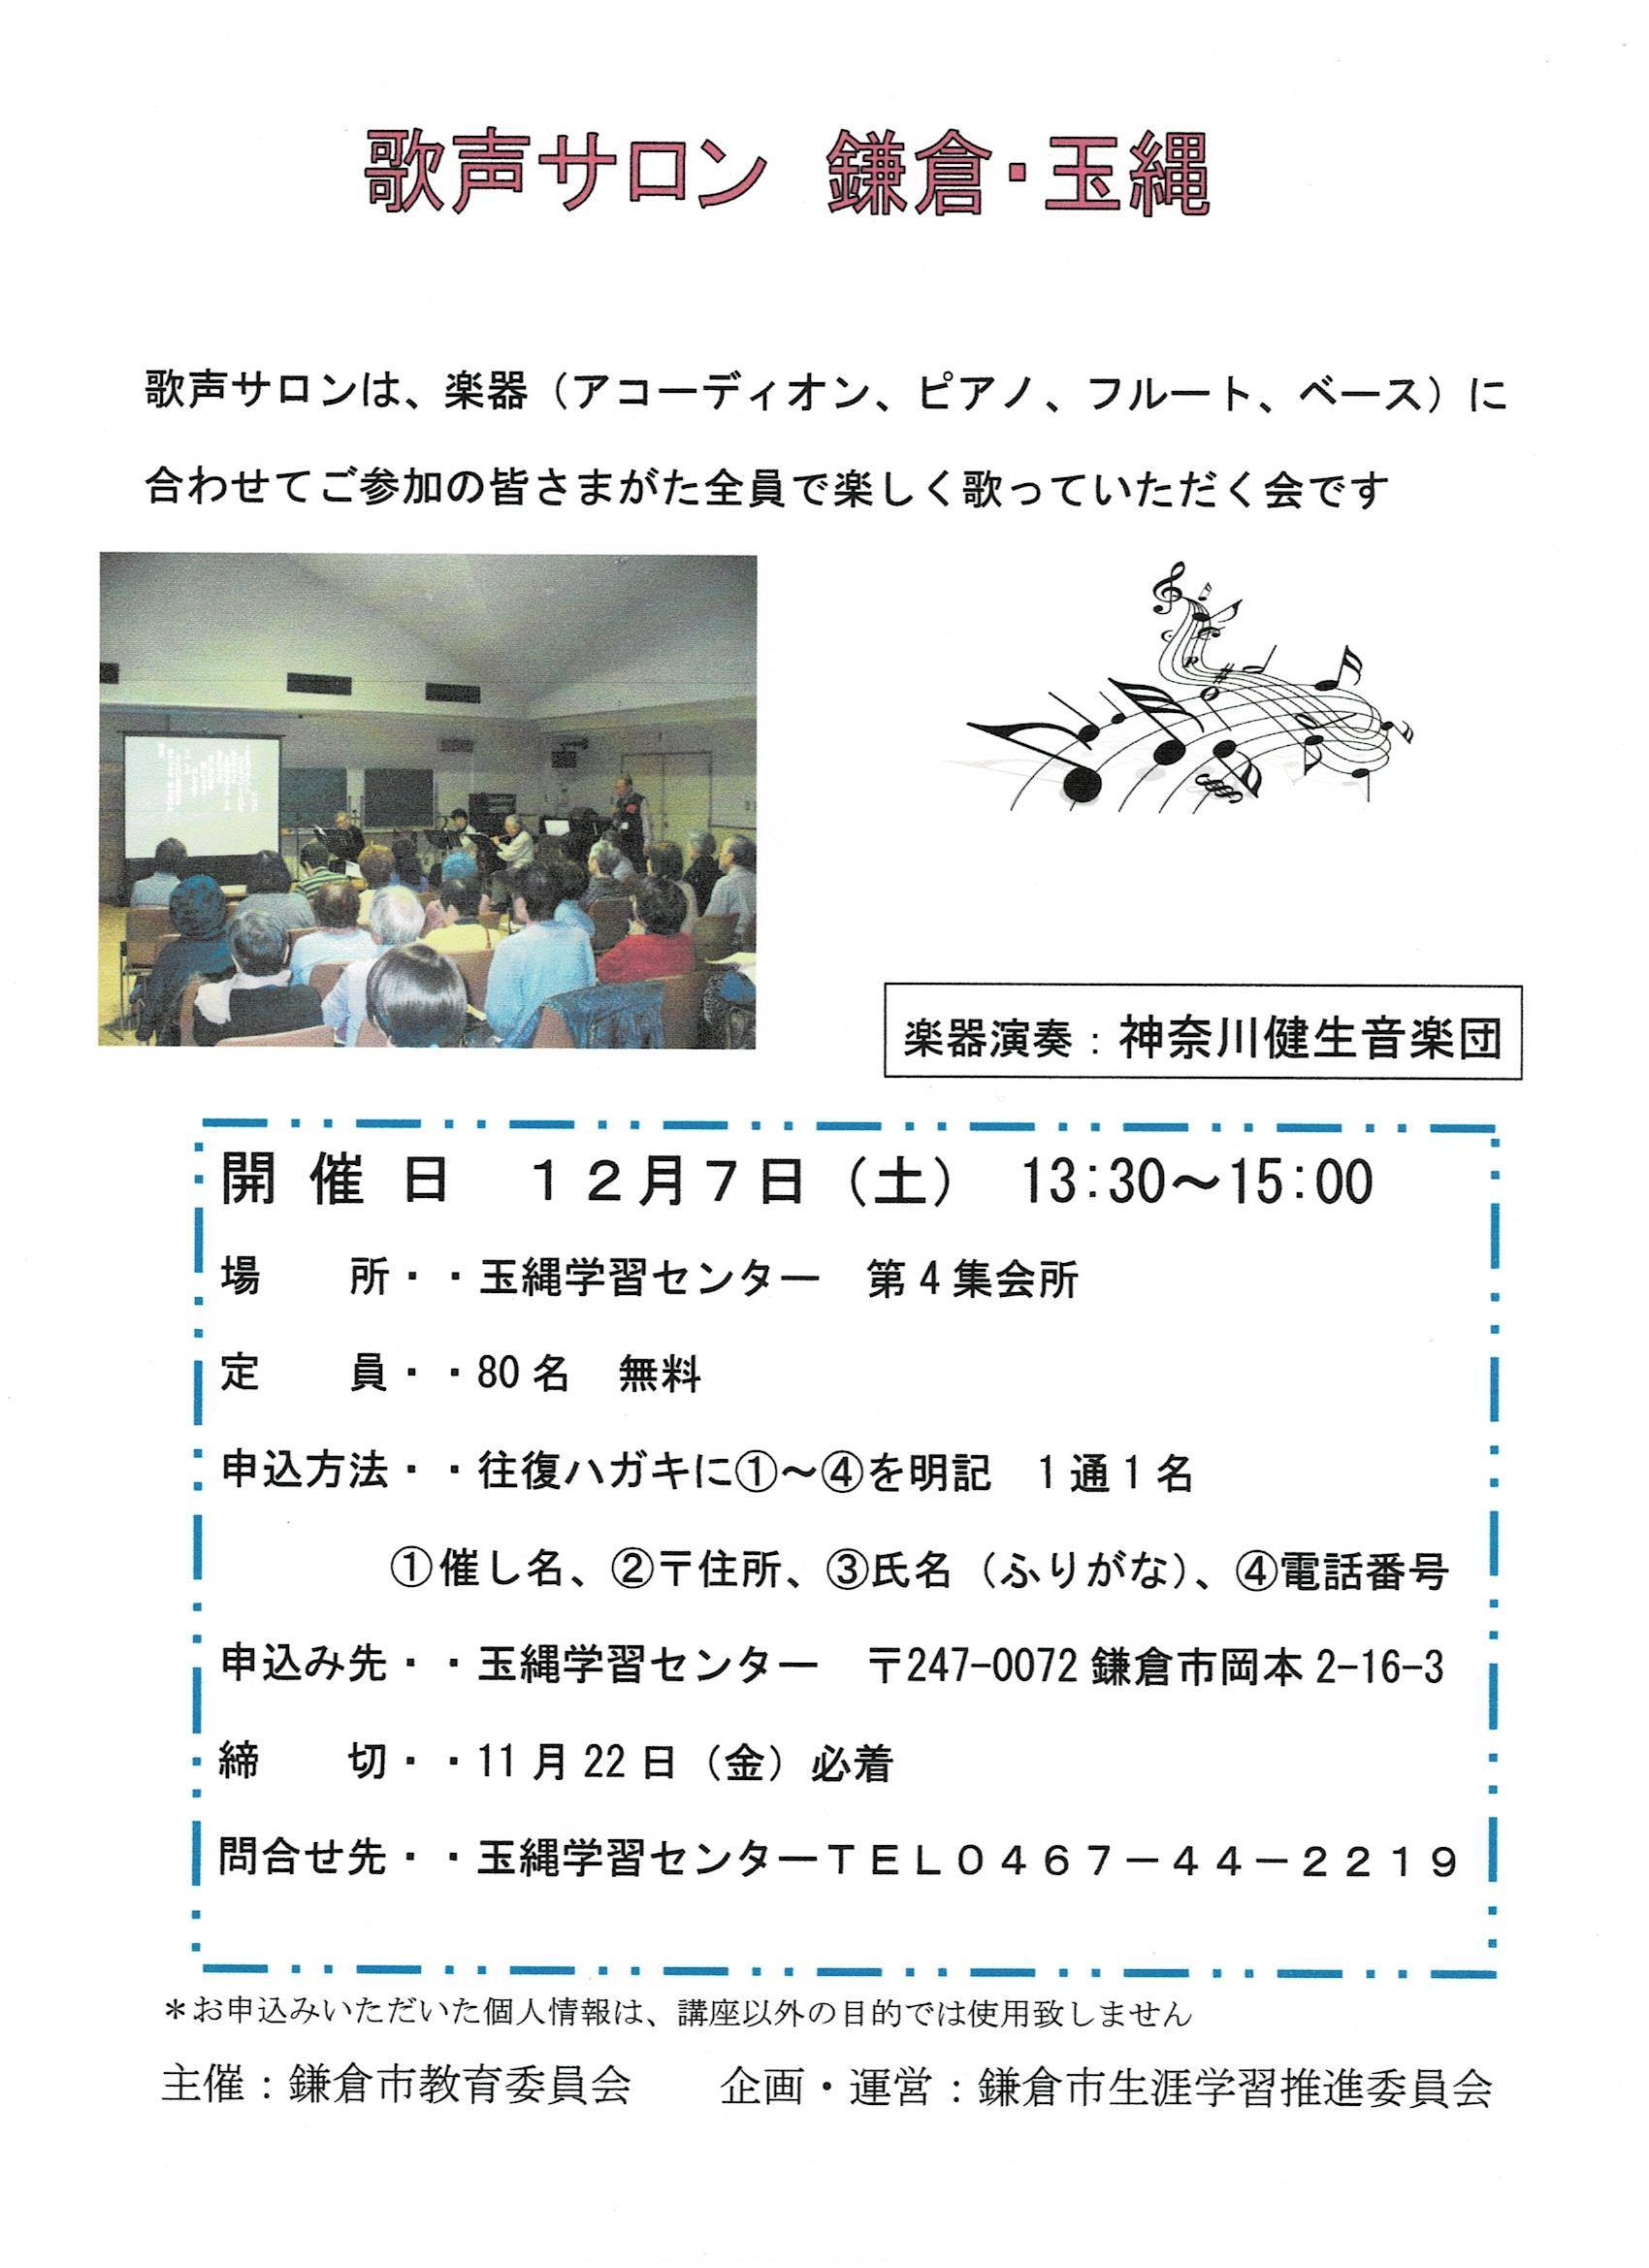 出前訪問演奏 「鎌倉玉縄学習センター」2019-12-7_e0221892_11345594.jpg